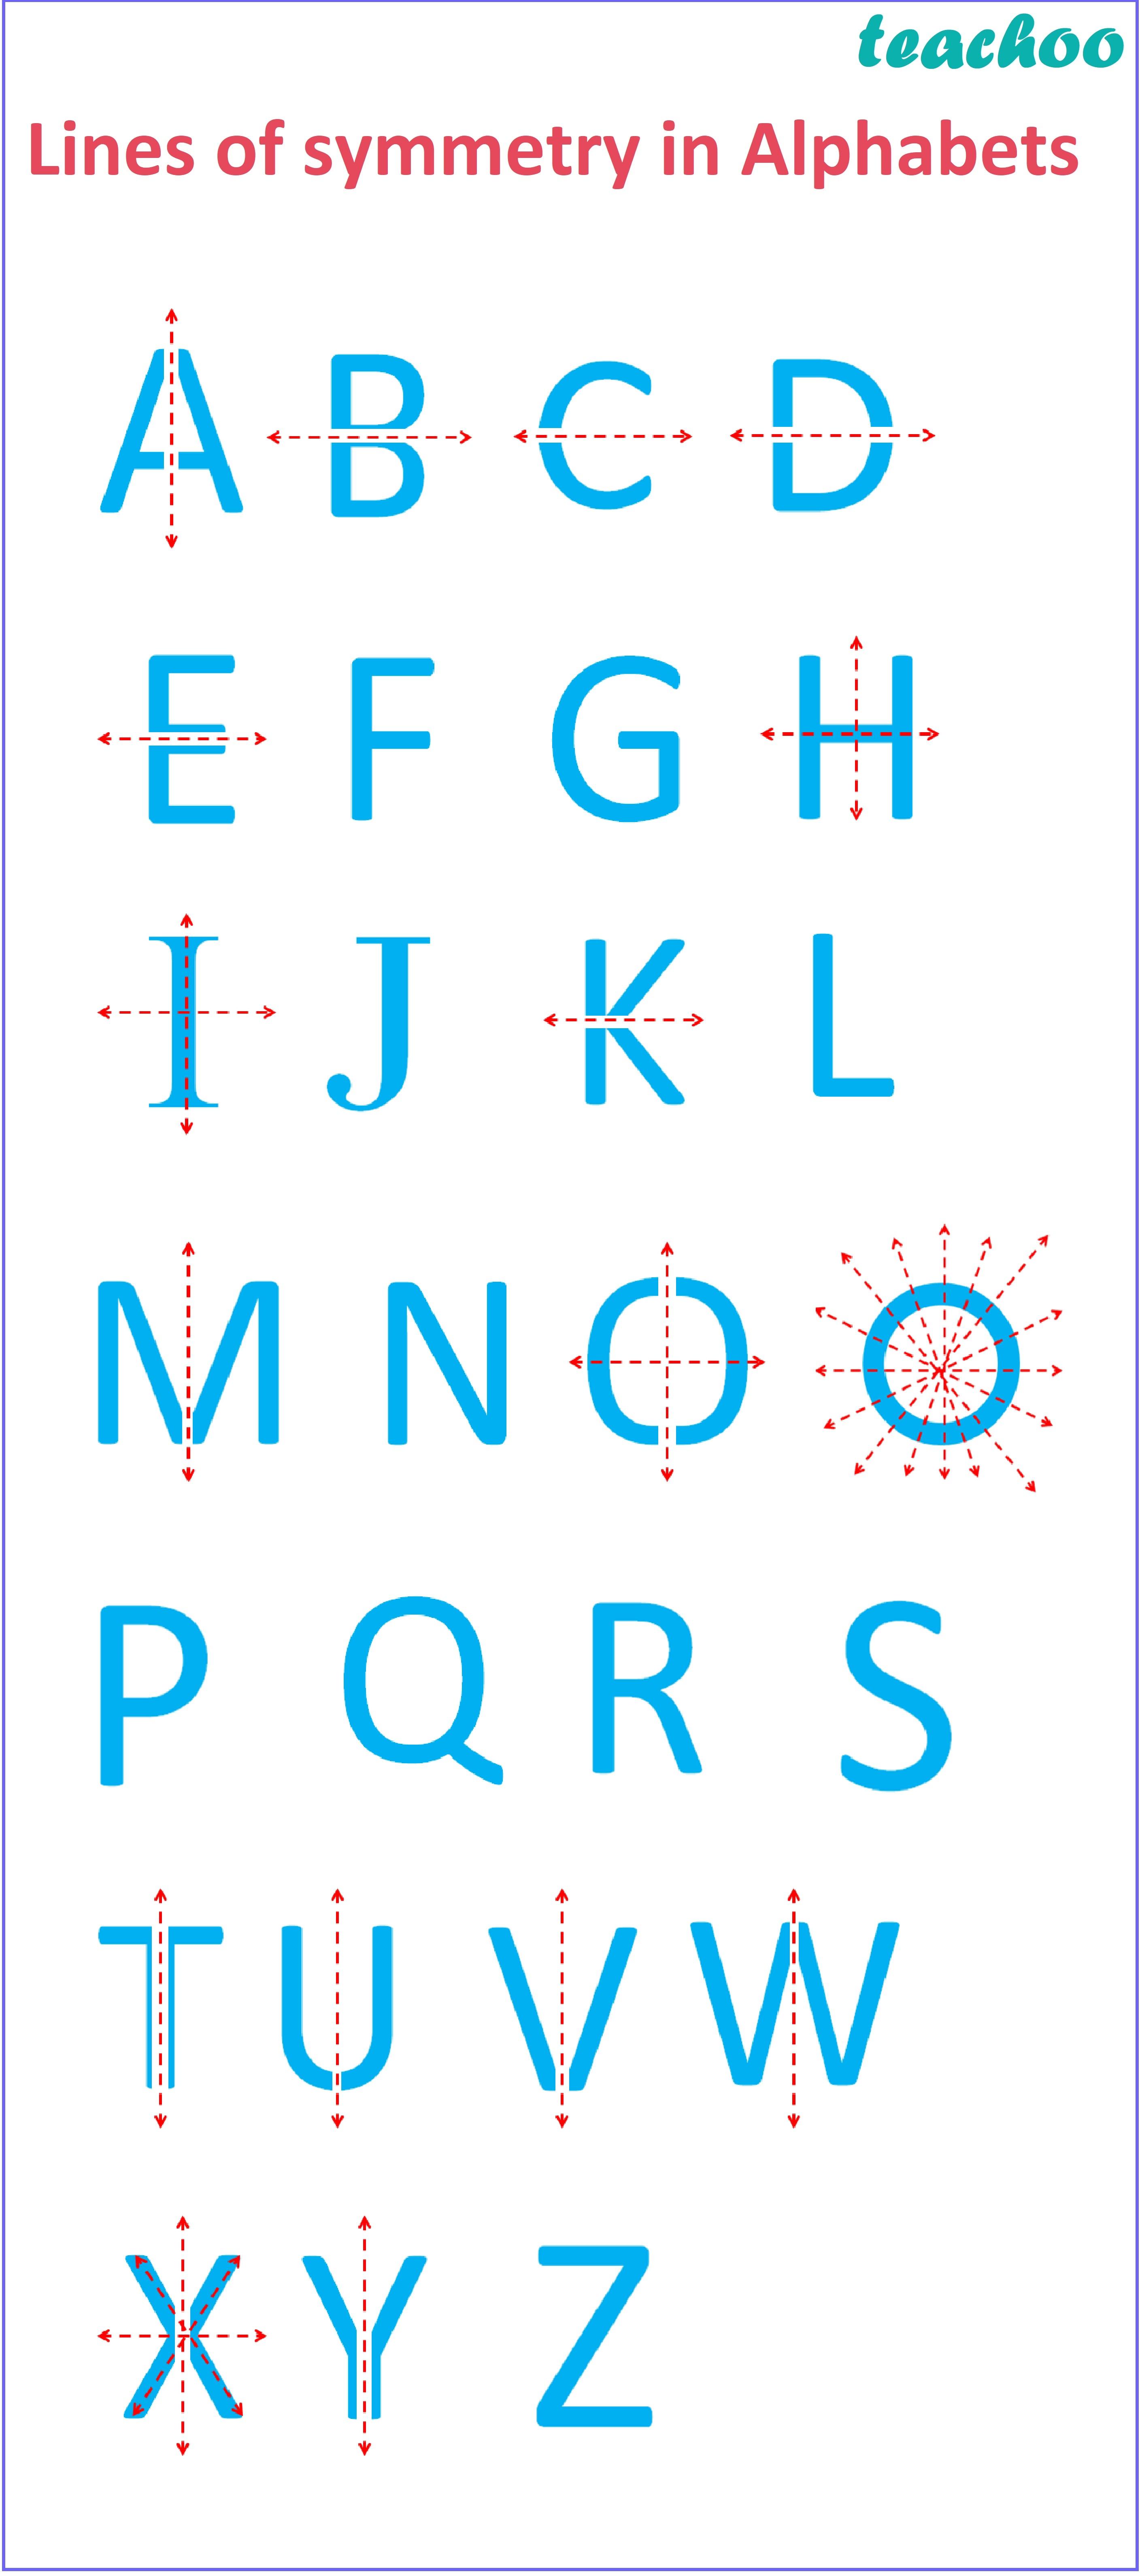 Lines of Symmetric in Alphabets - Teachoo.jpg